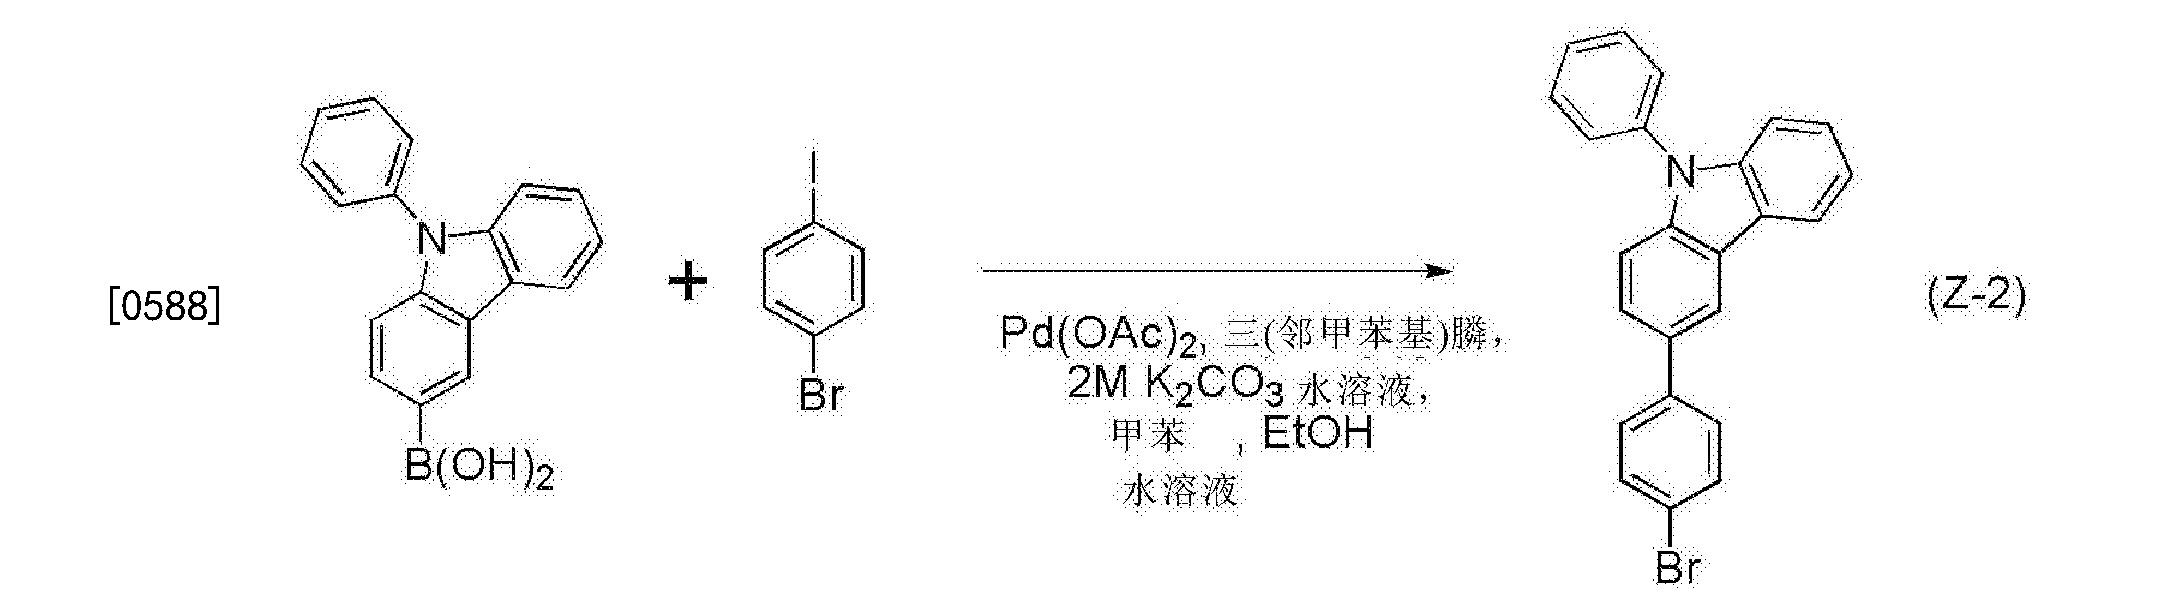 Figure CN106866430AD00741